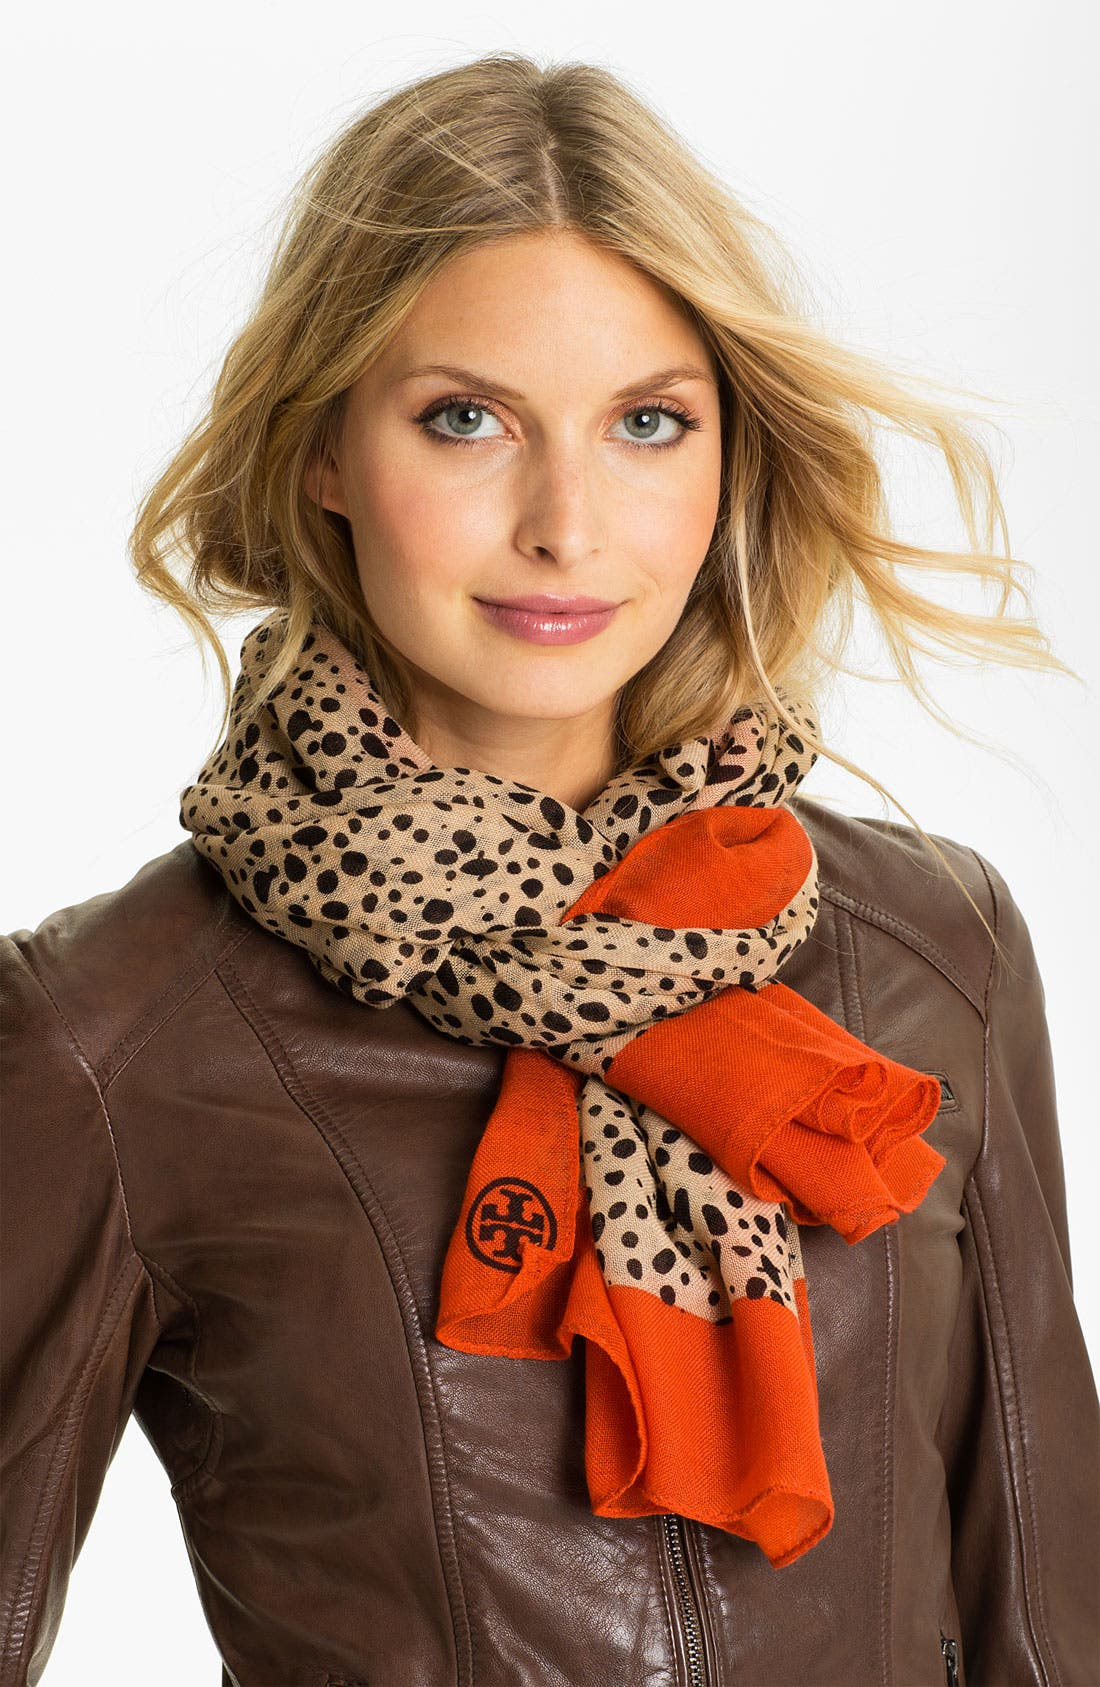 Alternate Image 1 Selected - Tory Burch 'Cheetah' Wool Scarf